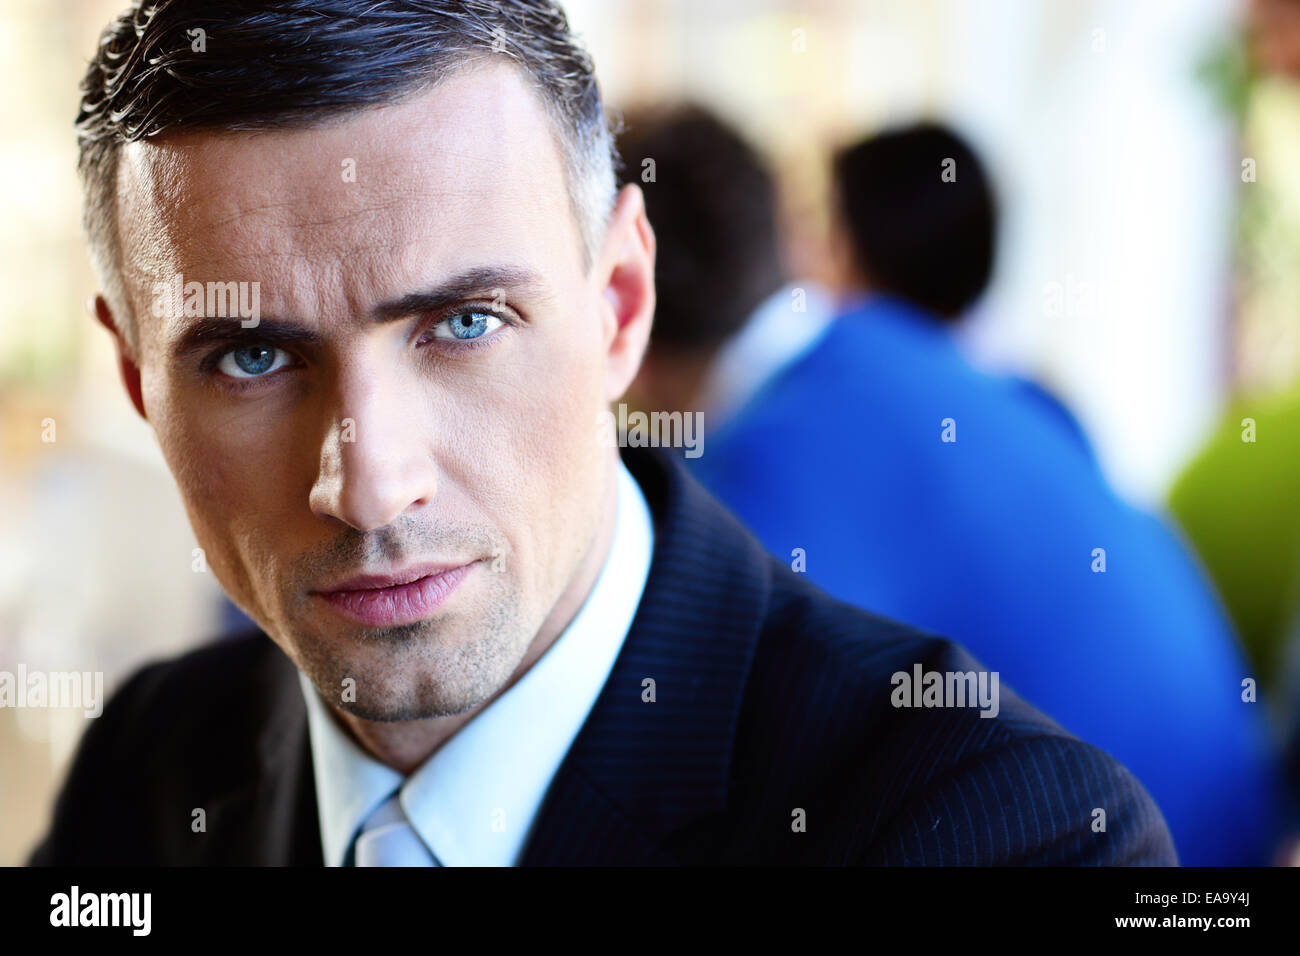 Closeup portrait of a serious businessman Photo Stock